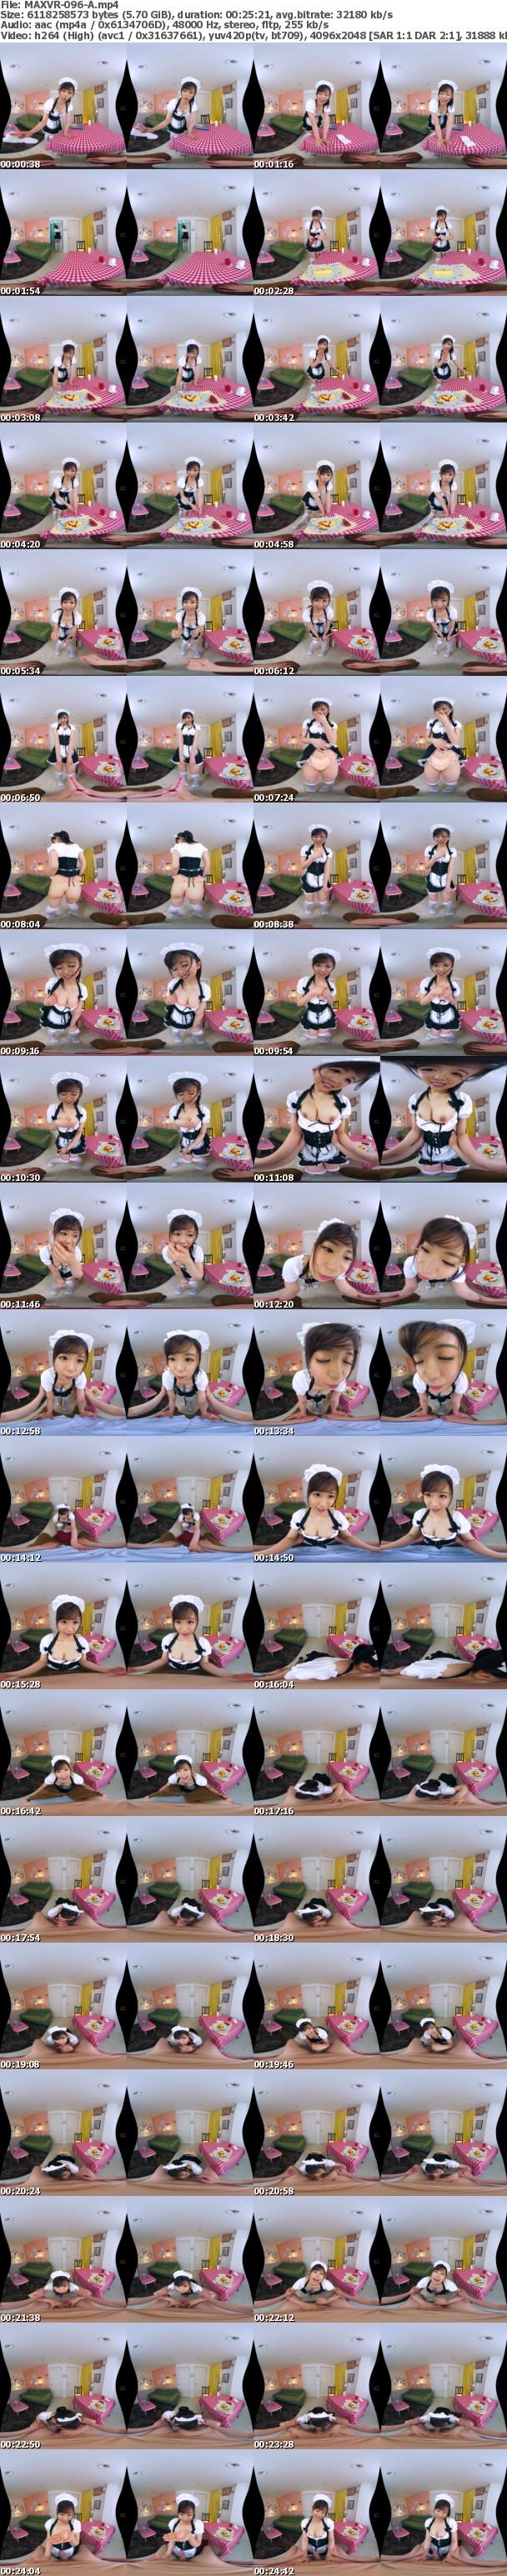 (VR) MAXVR-096 人気No.1メイドの(秘)キュンキュンご奉仕(ハート) お店に内緒の愛情溢れる大潮吹きスペシャルサービス 宮村ななこ